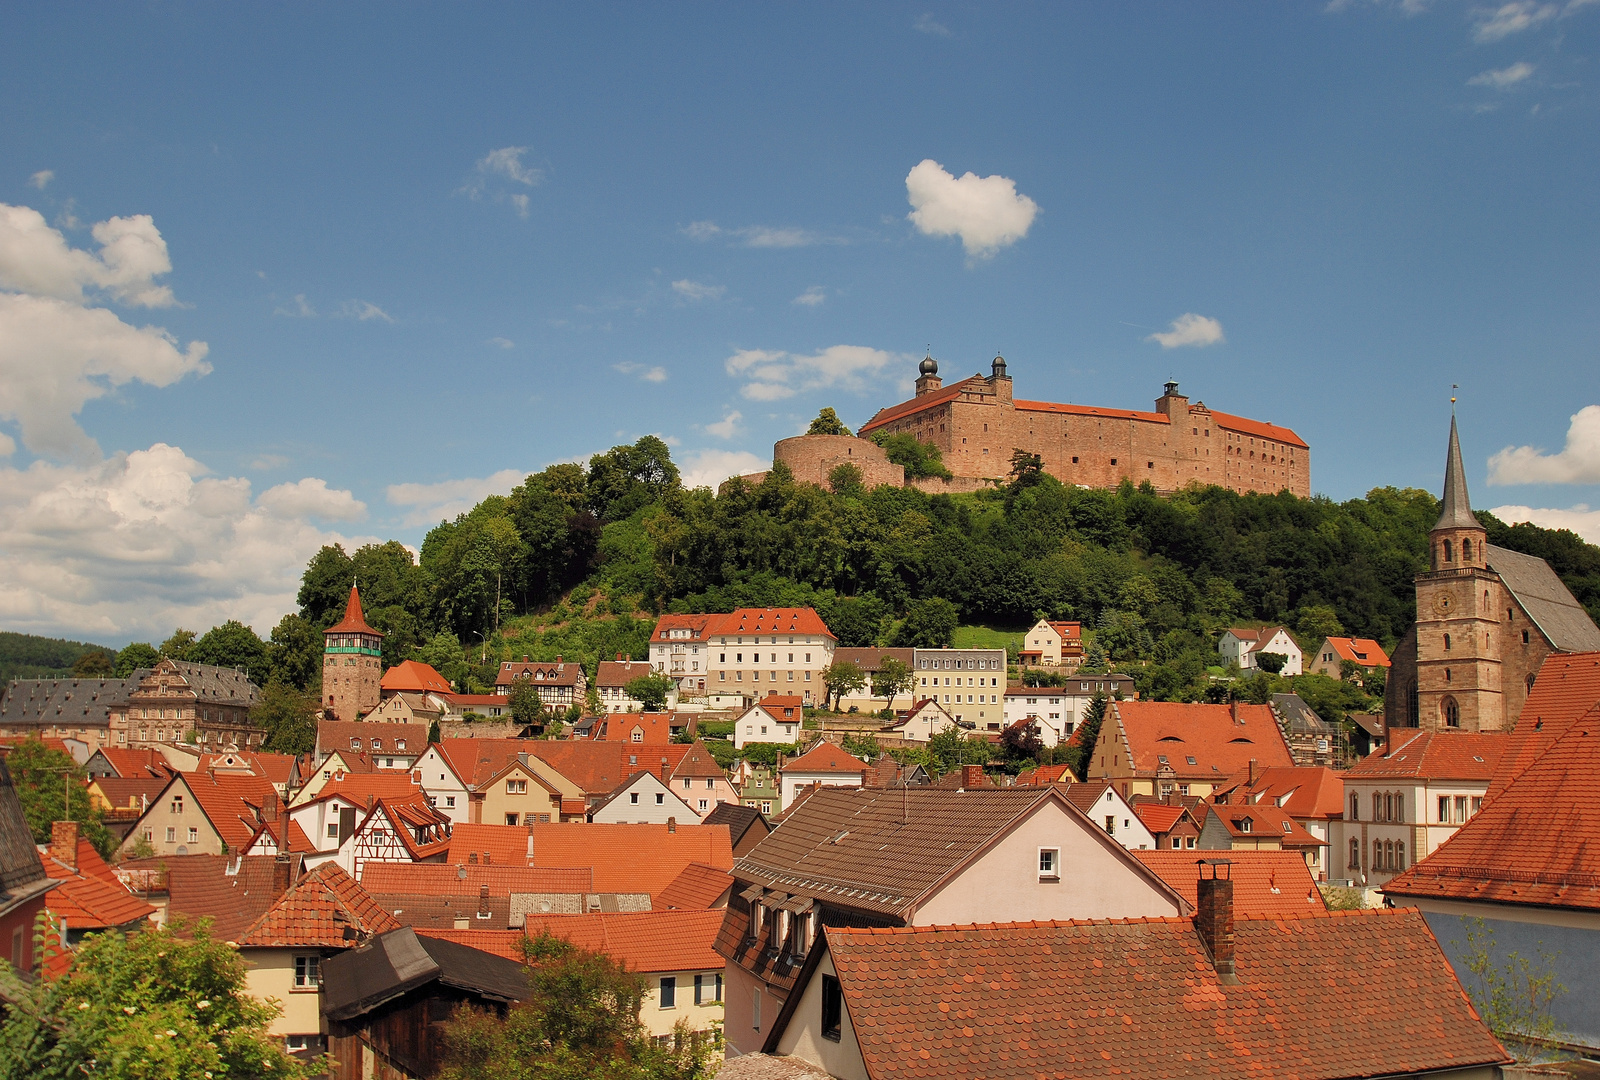 Die Plassenburg ob. Kulmbach